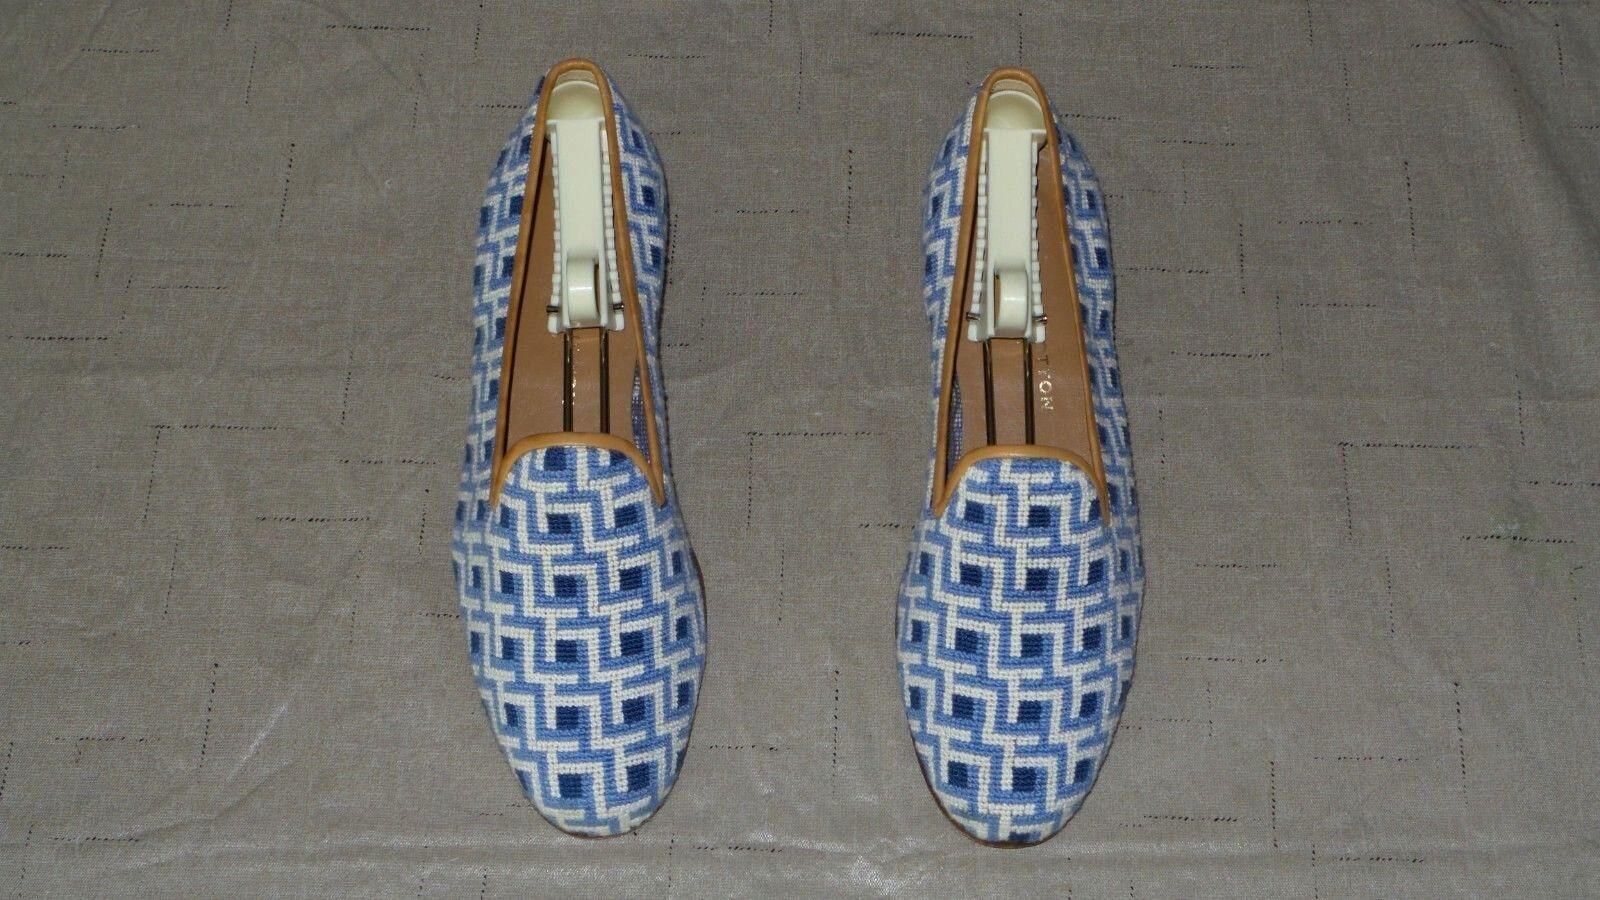 Tan and lindo Mujer Stubbs and Tan wootton pasos Océano Zapatillas Mocasines Zapatos 9bccf7